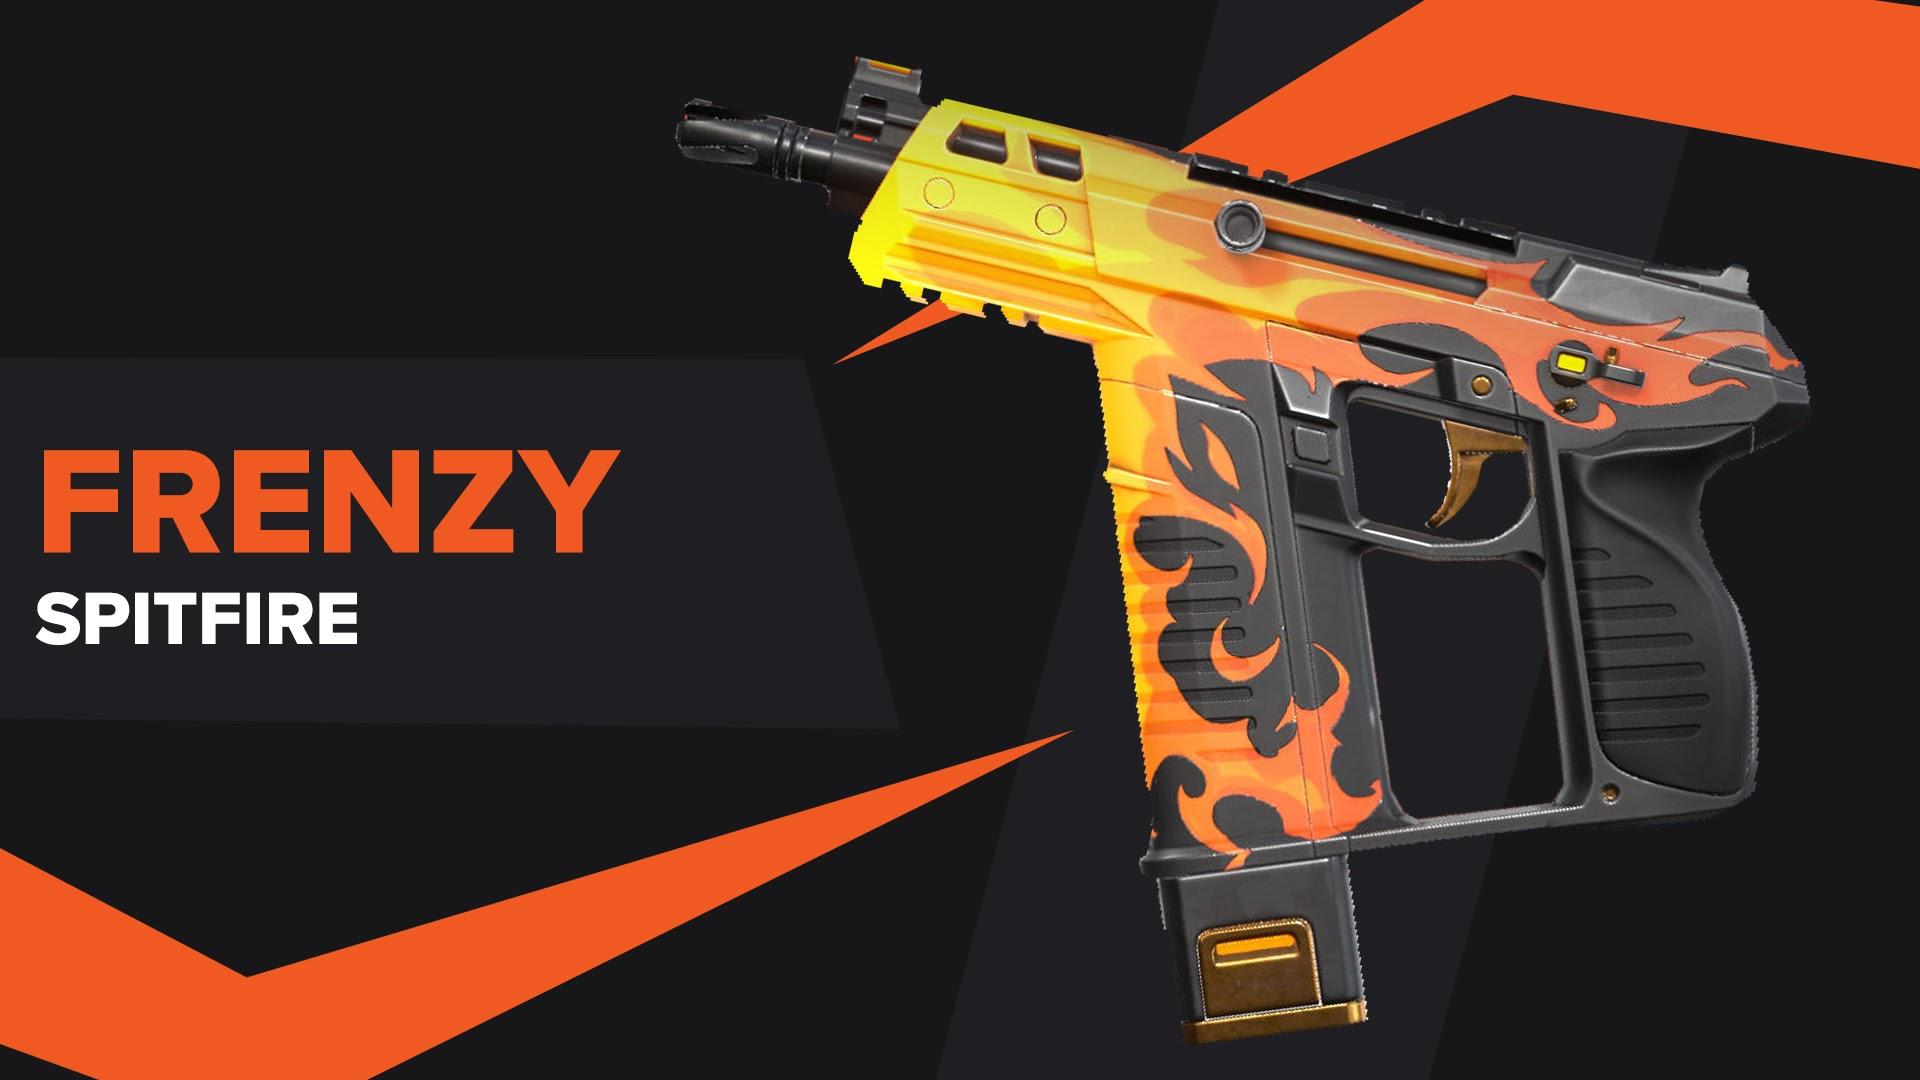 Frenzy Spitfire Skin